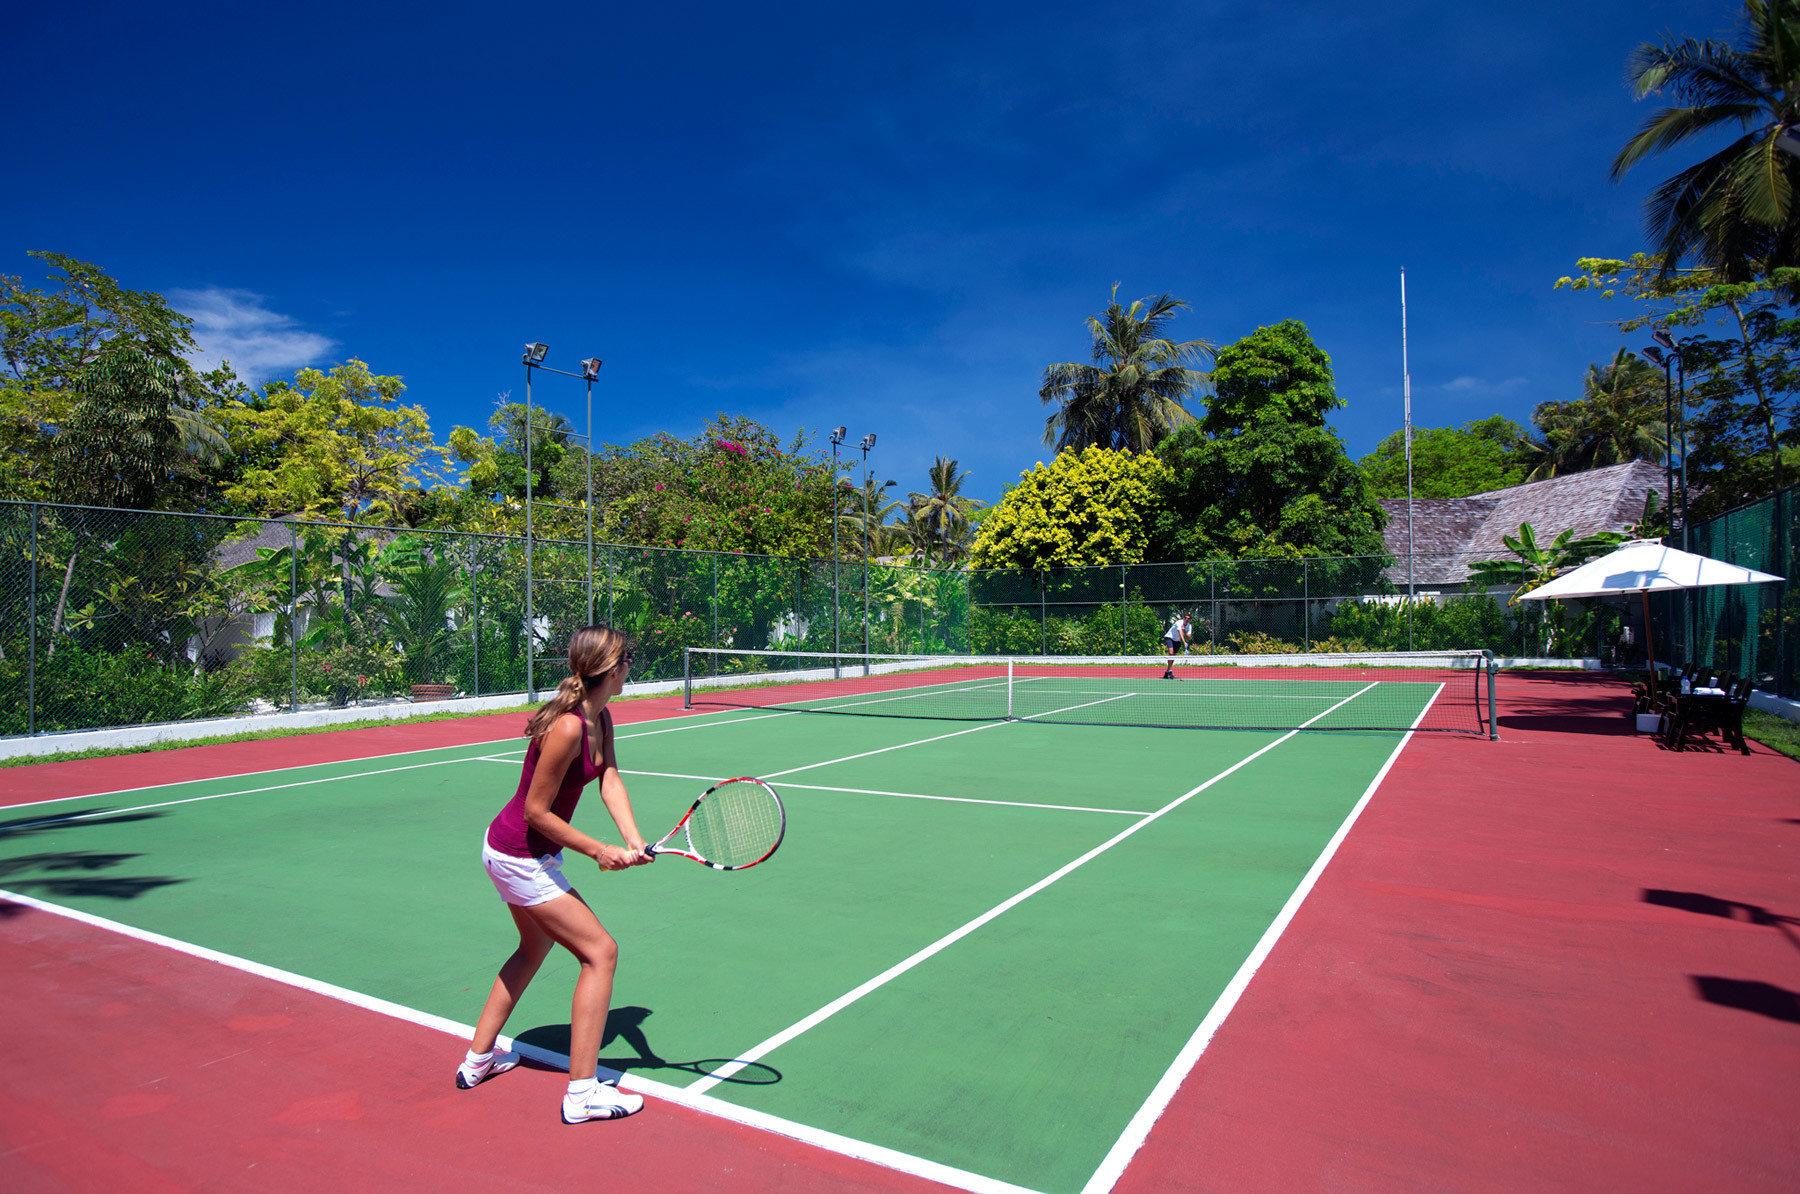 tree Sport athletic game tennis sky court structure sports leisure sport venue racquet sport tennis court